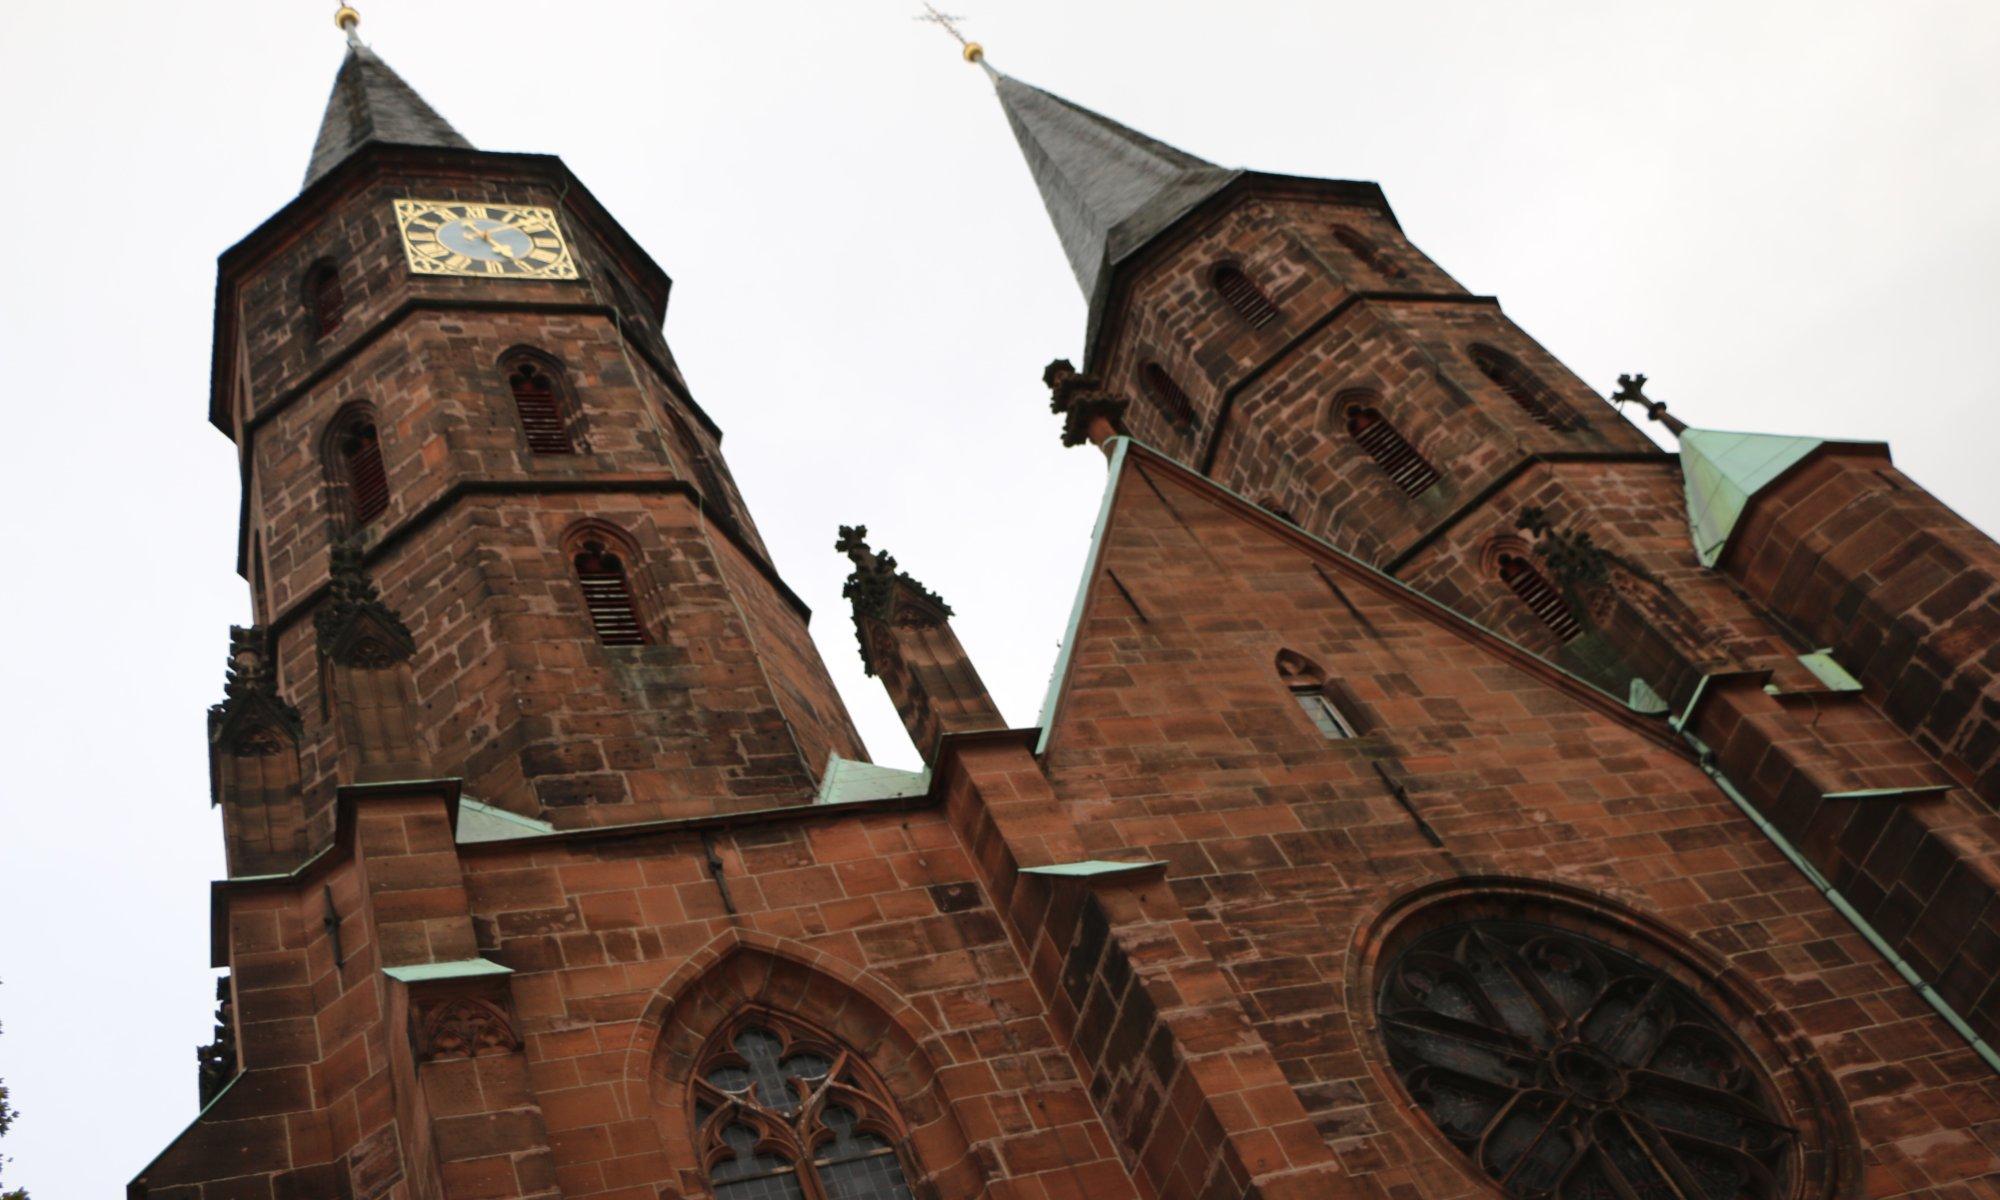 Stiftskirche, Kaiserslautern